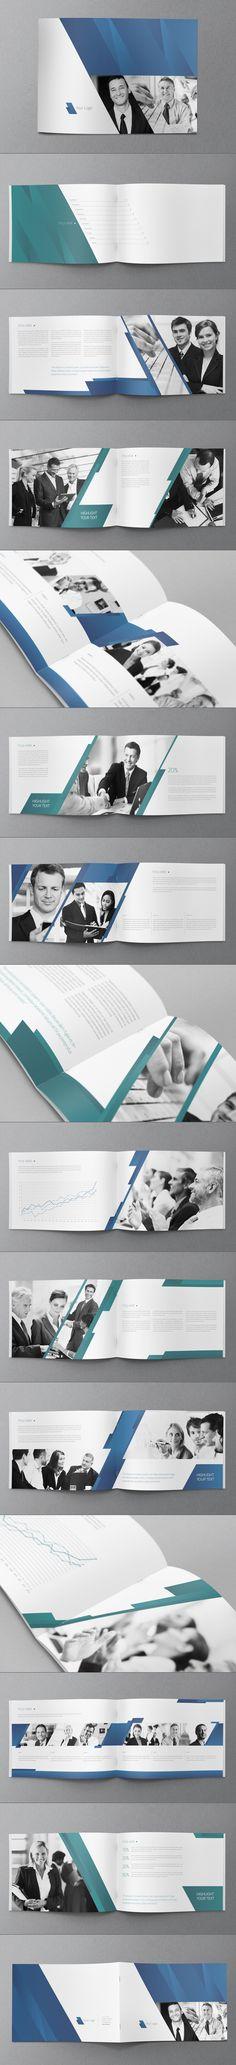 Business Brochure Design by Abra Design, via Behance